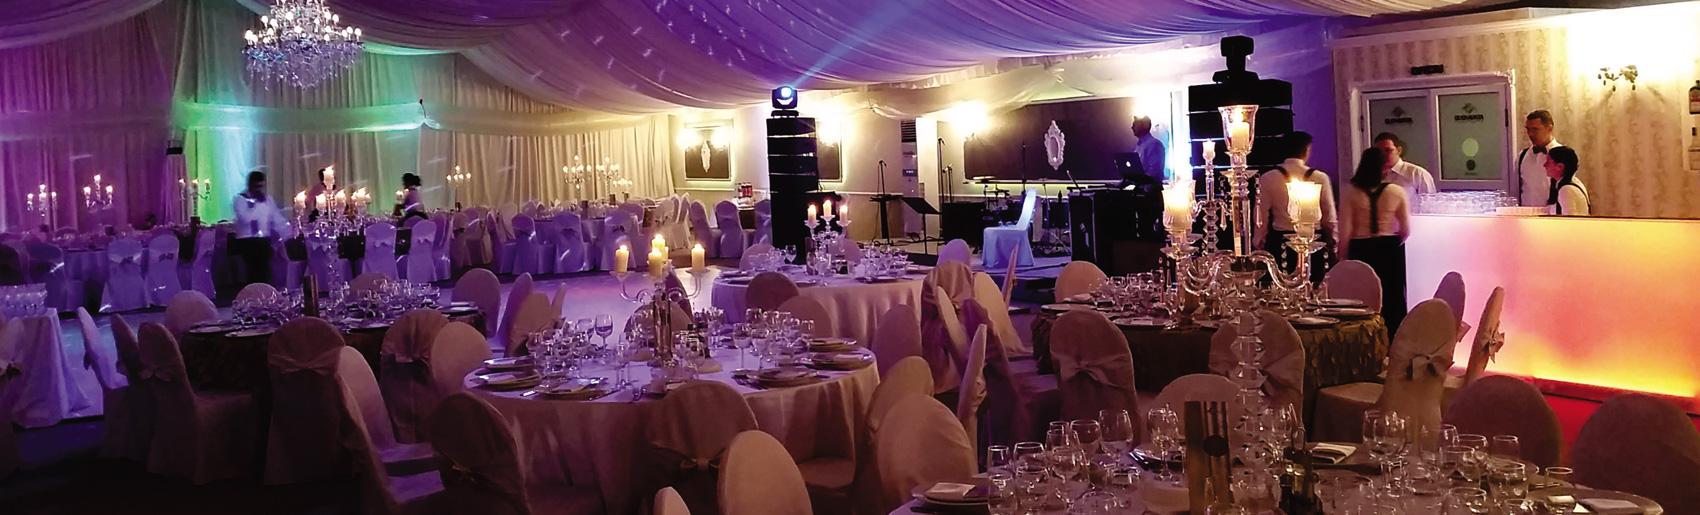 Versailles Weddings Events Buonavista Catering